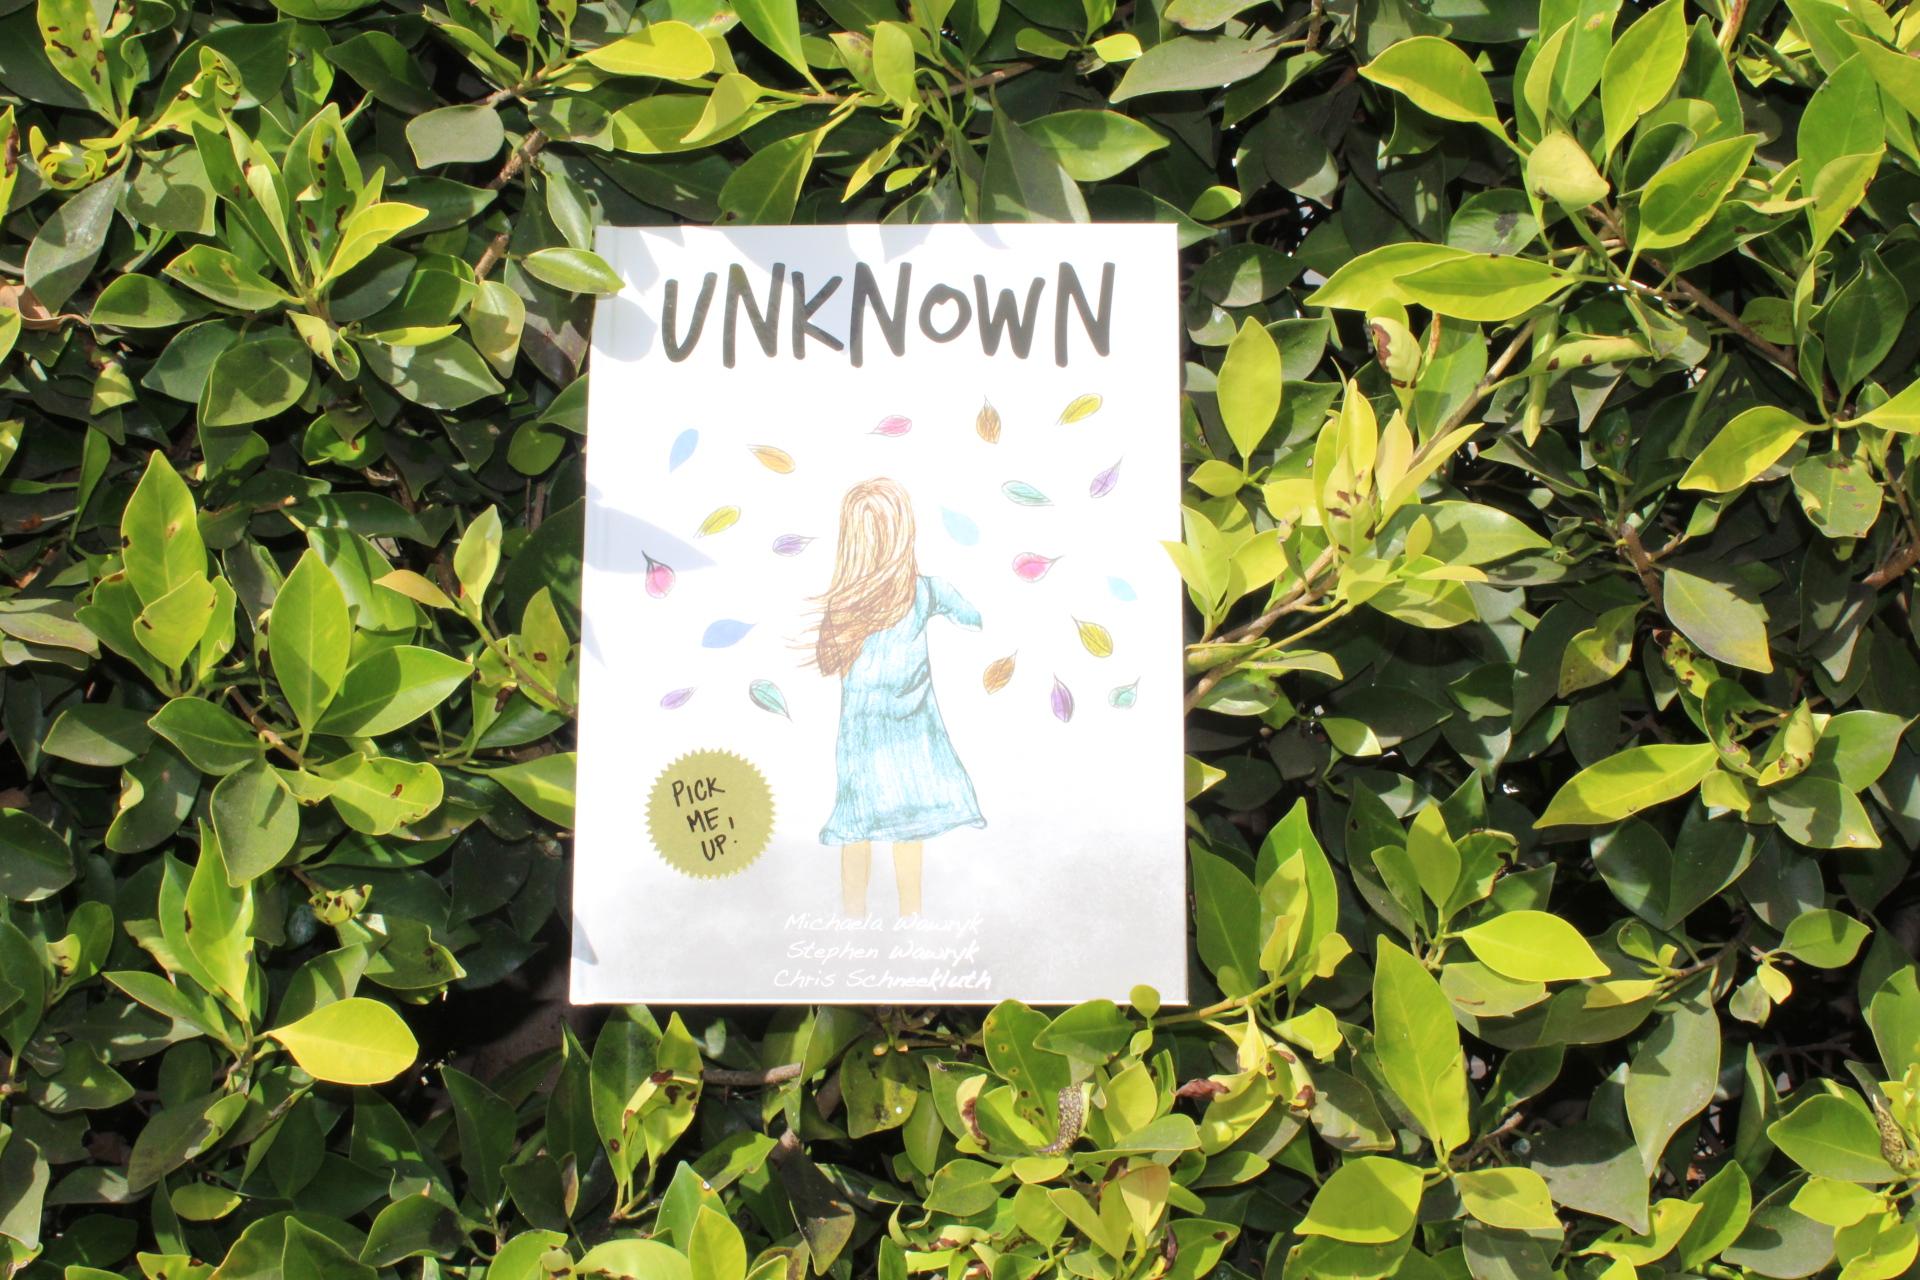 stephen-wawryk-unknown-the-book